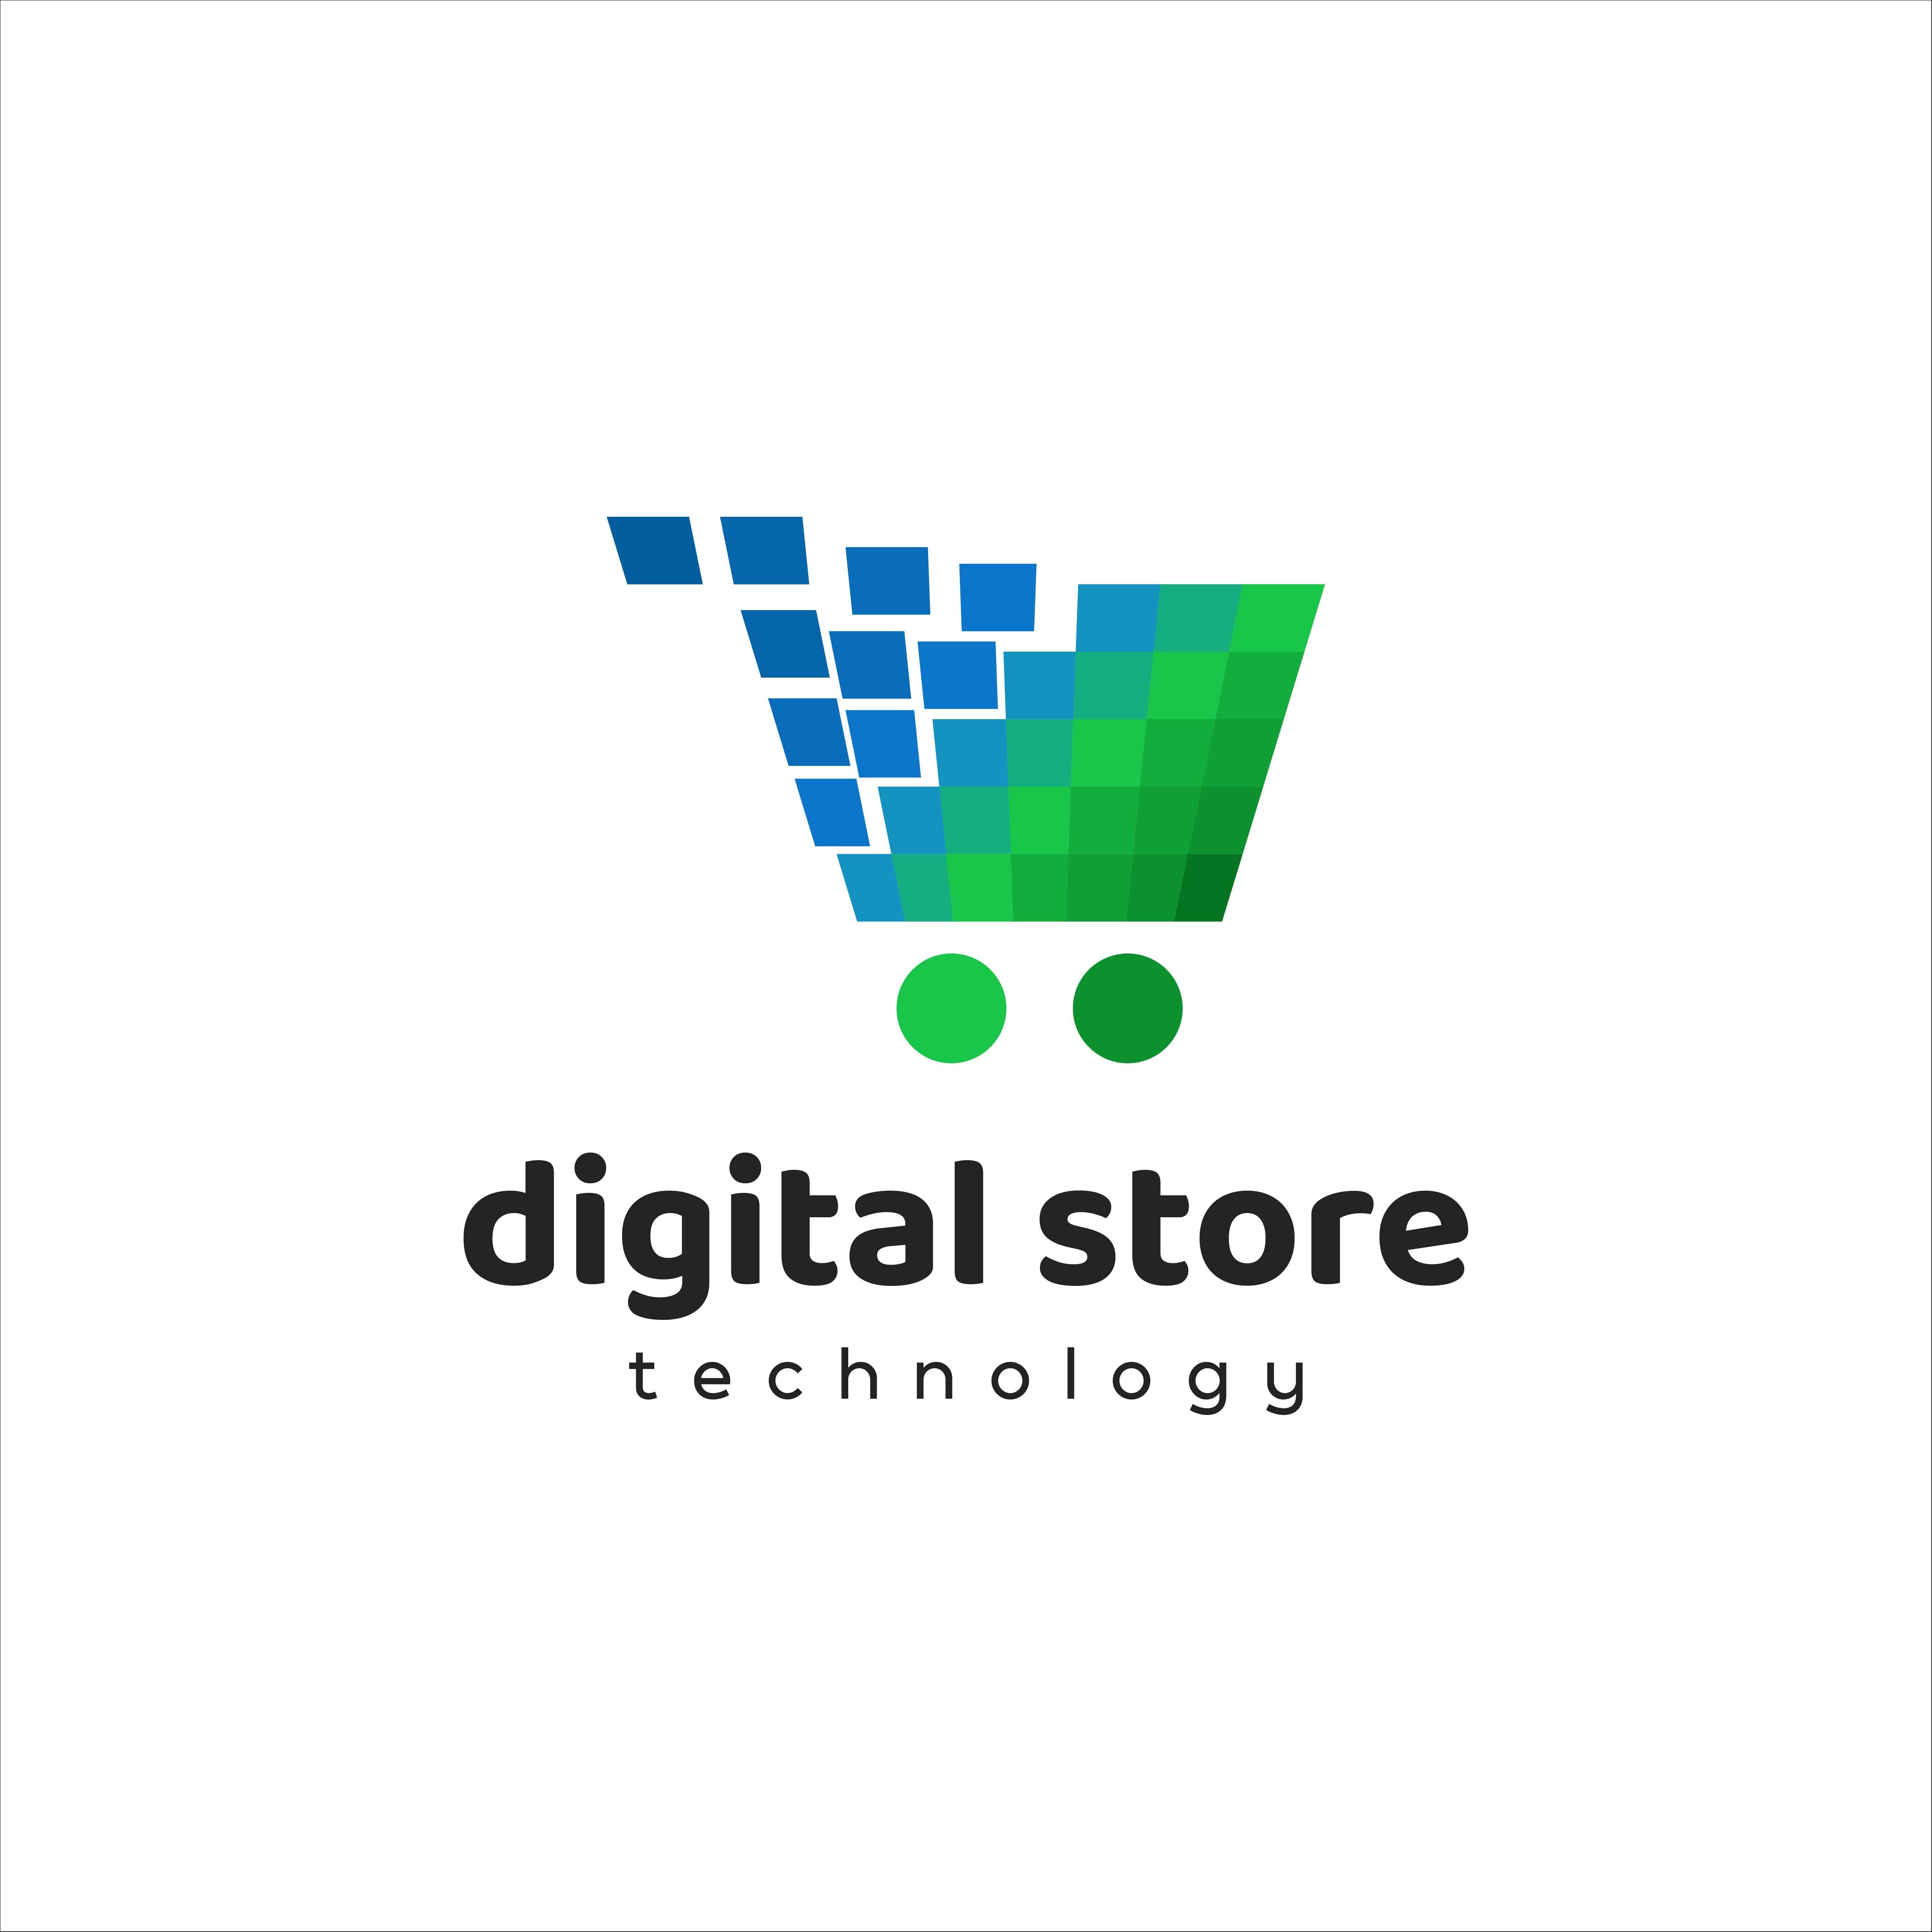 Digital Store Technology Logo In 2020 Logo Design Modern Logo Design Logos